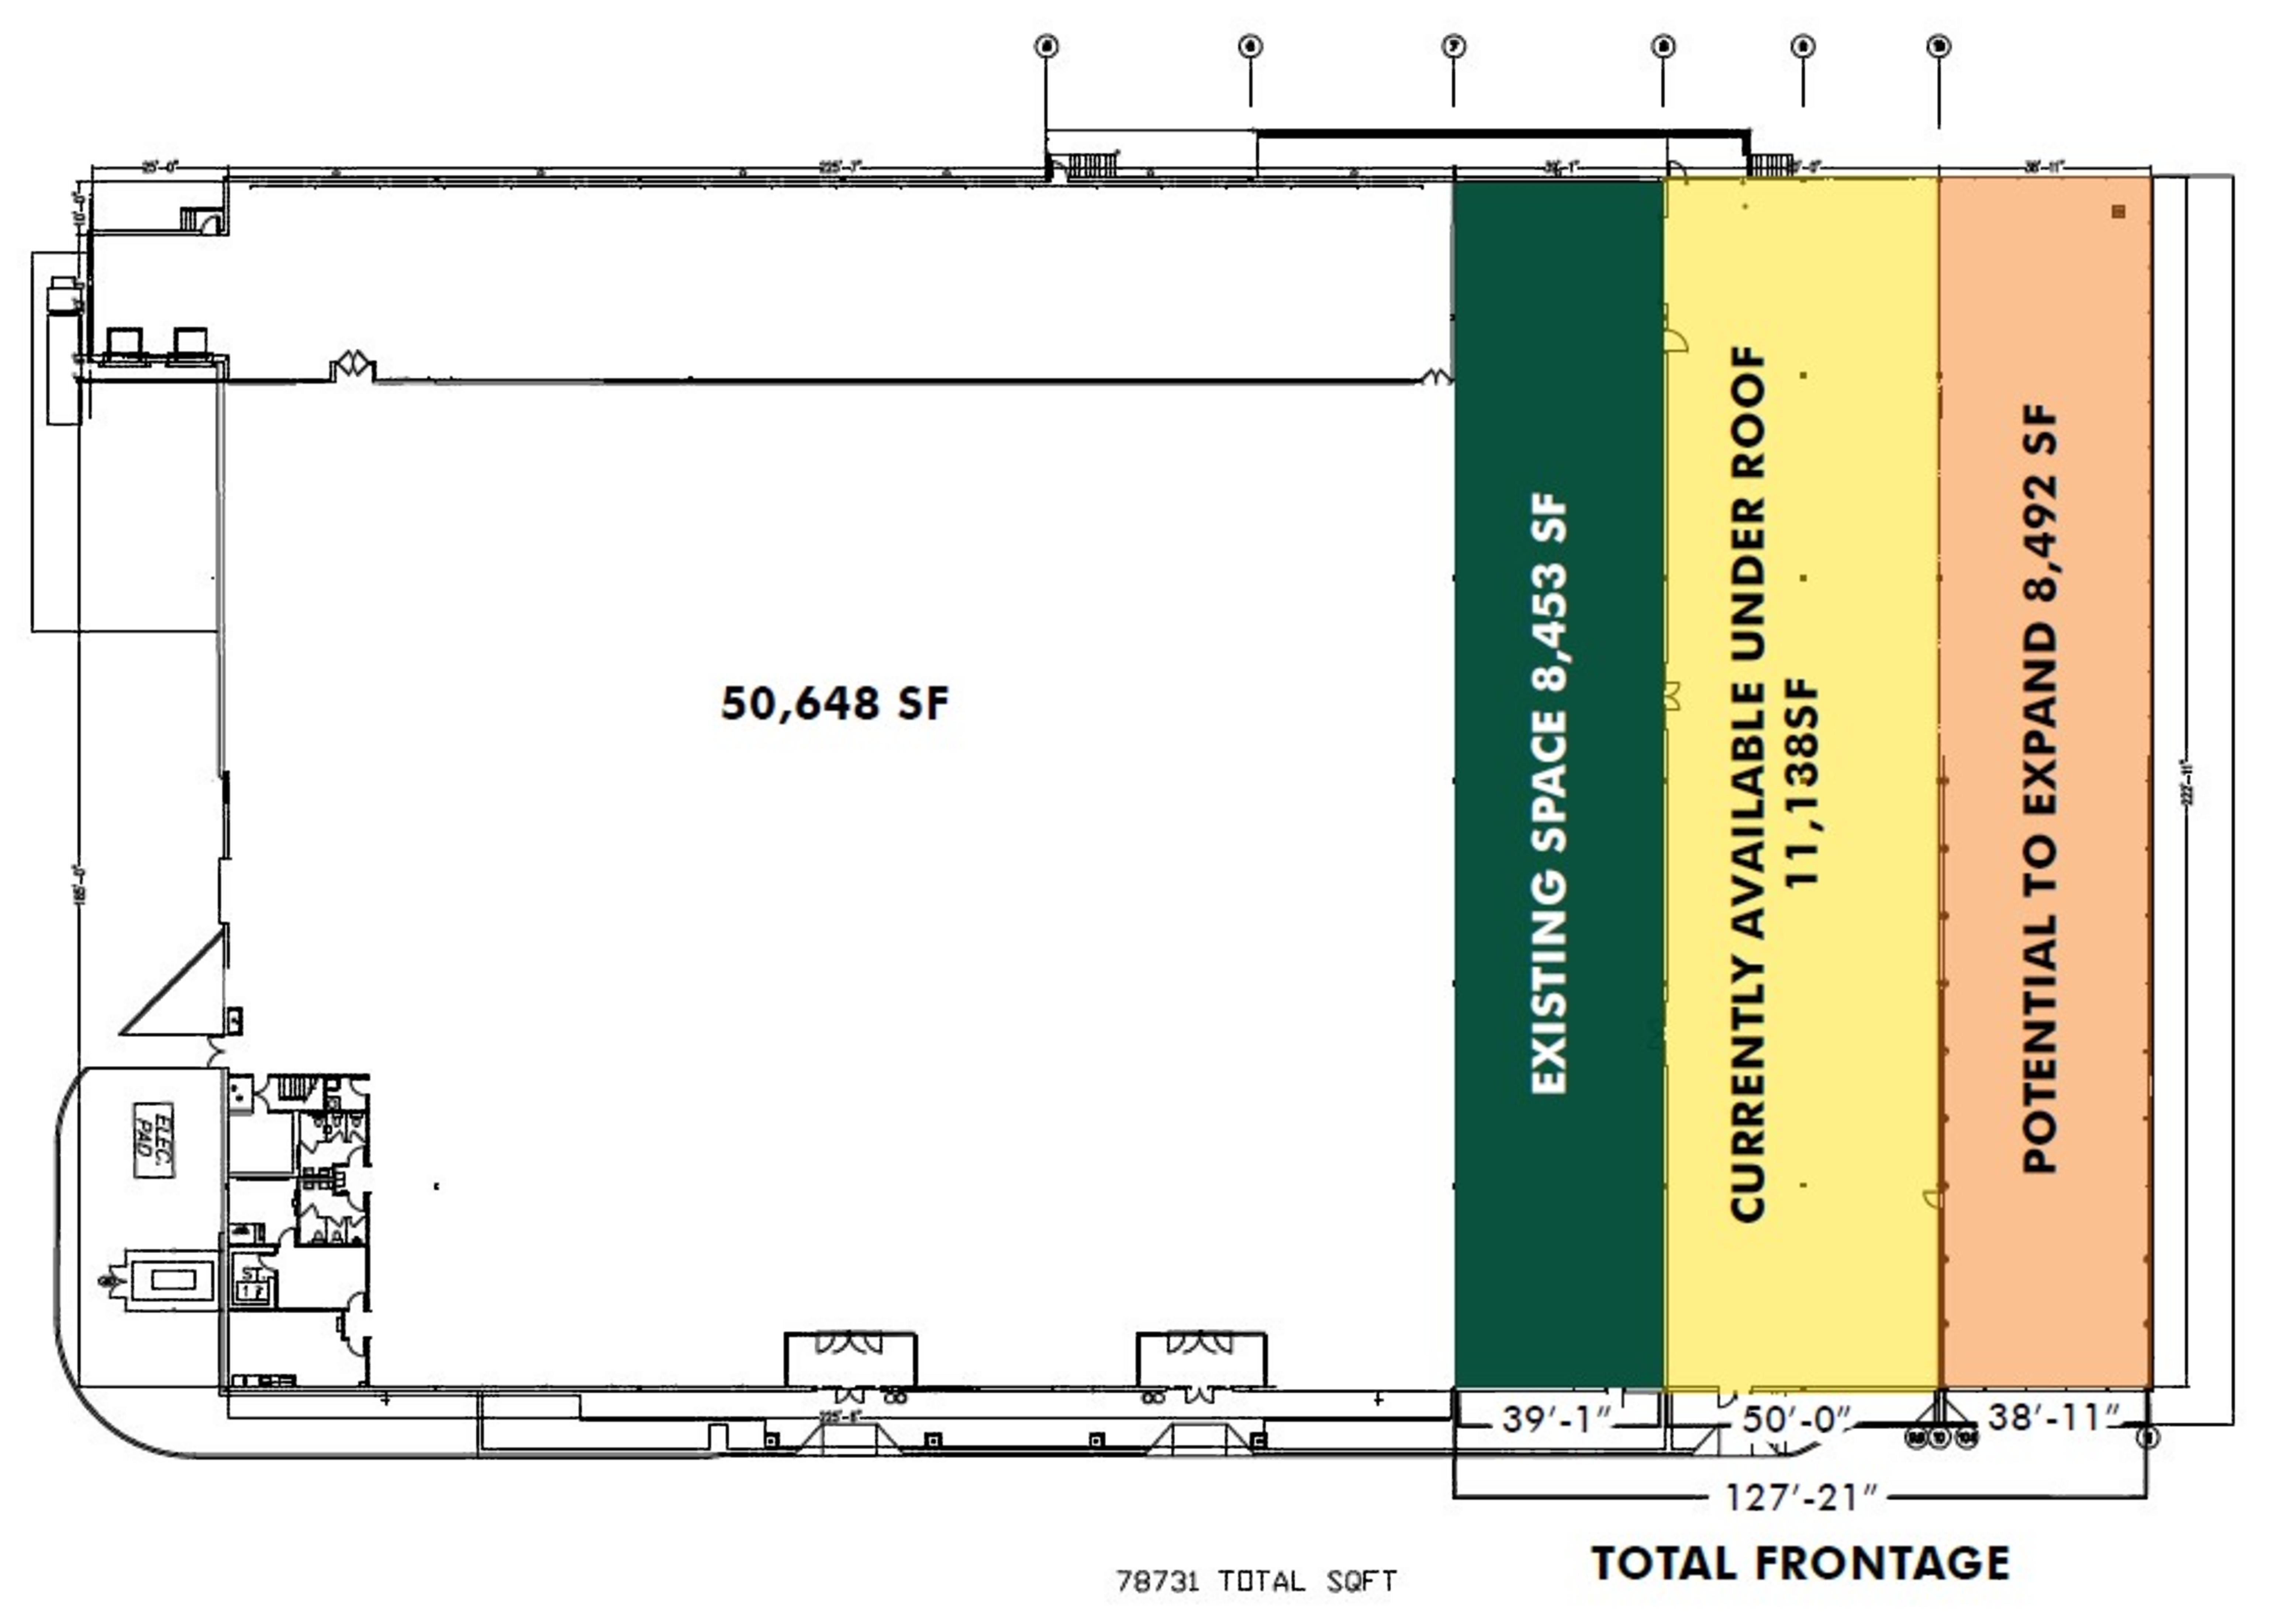 2811 Dekalb Pike: site plan